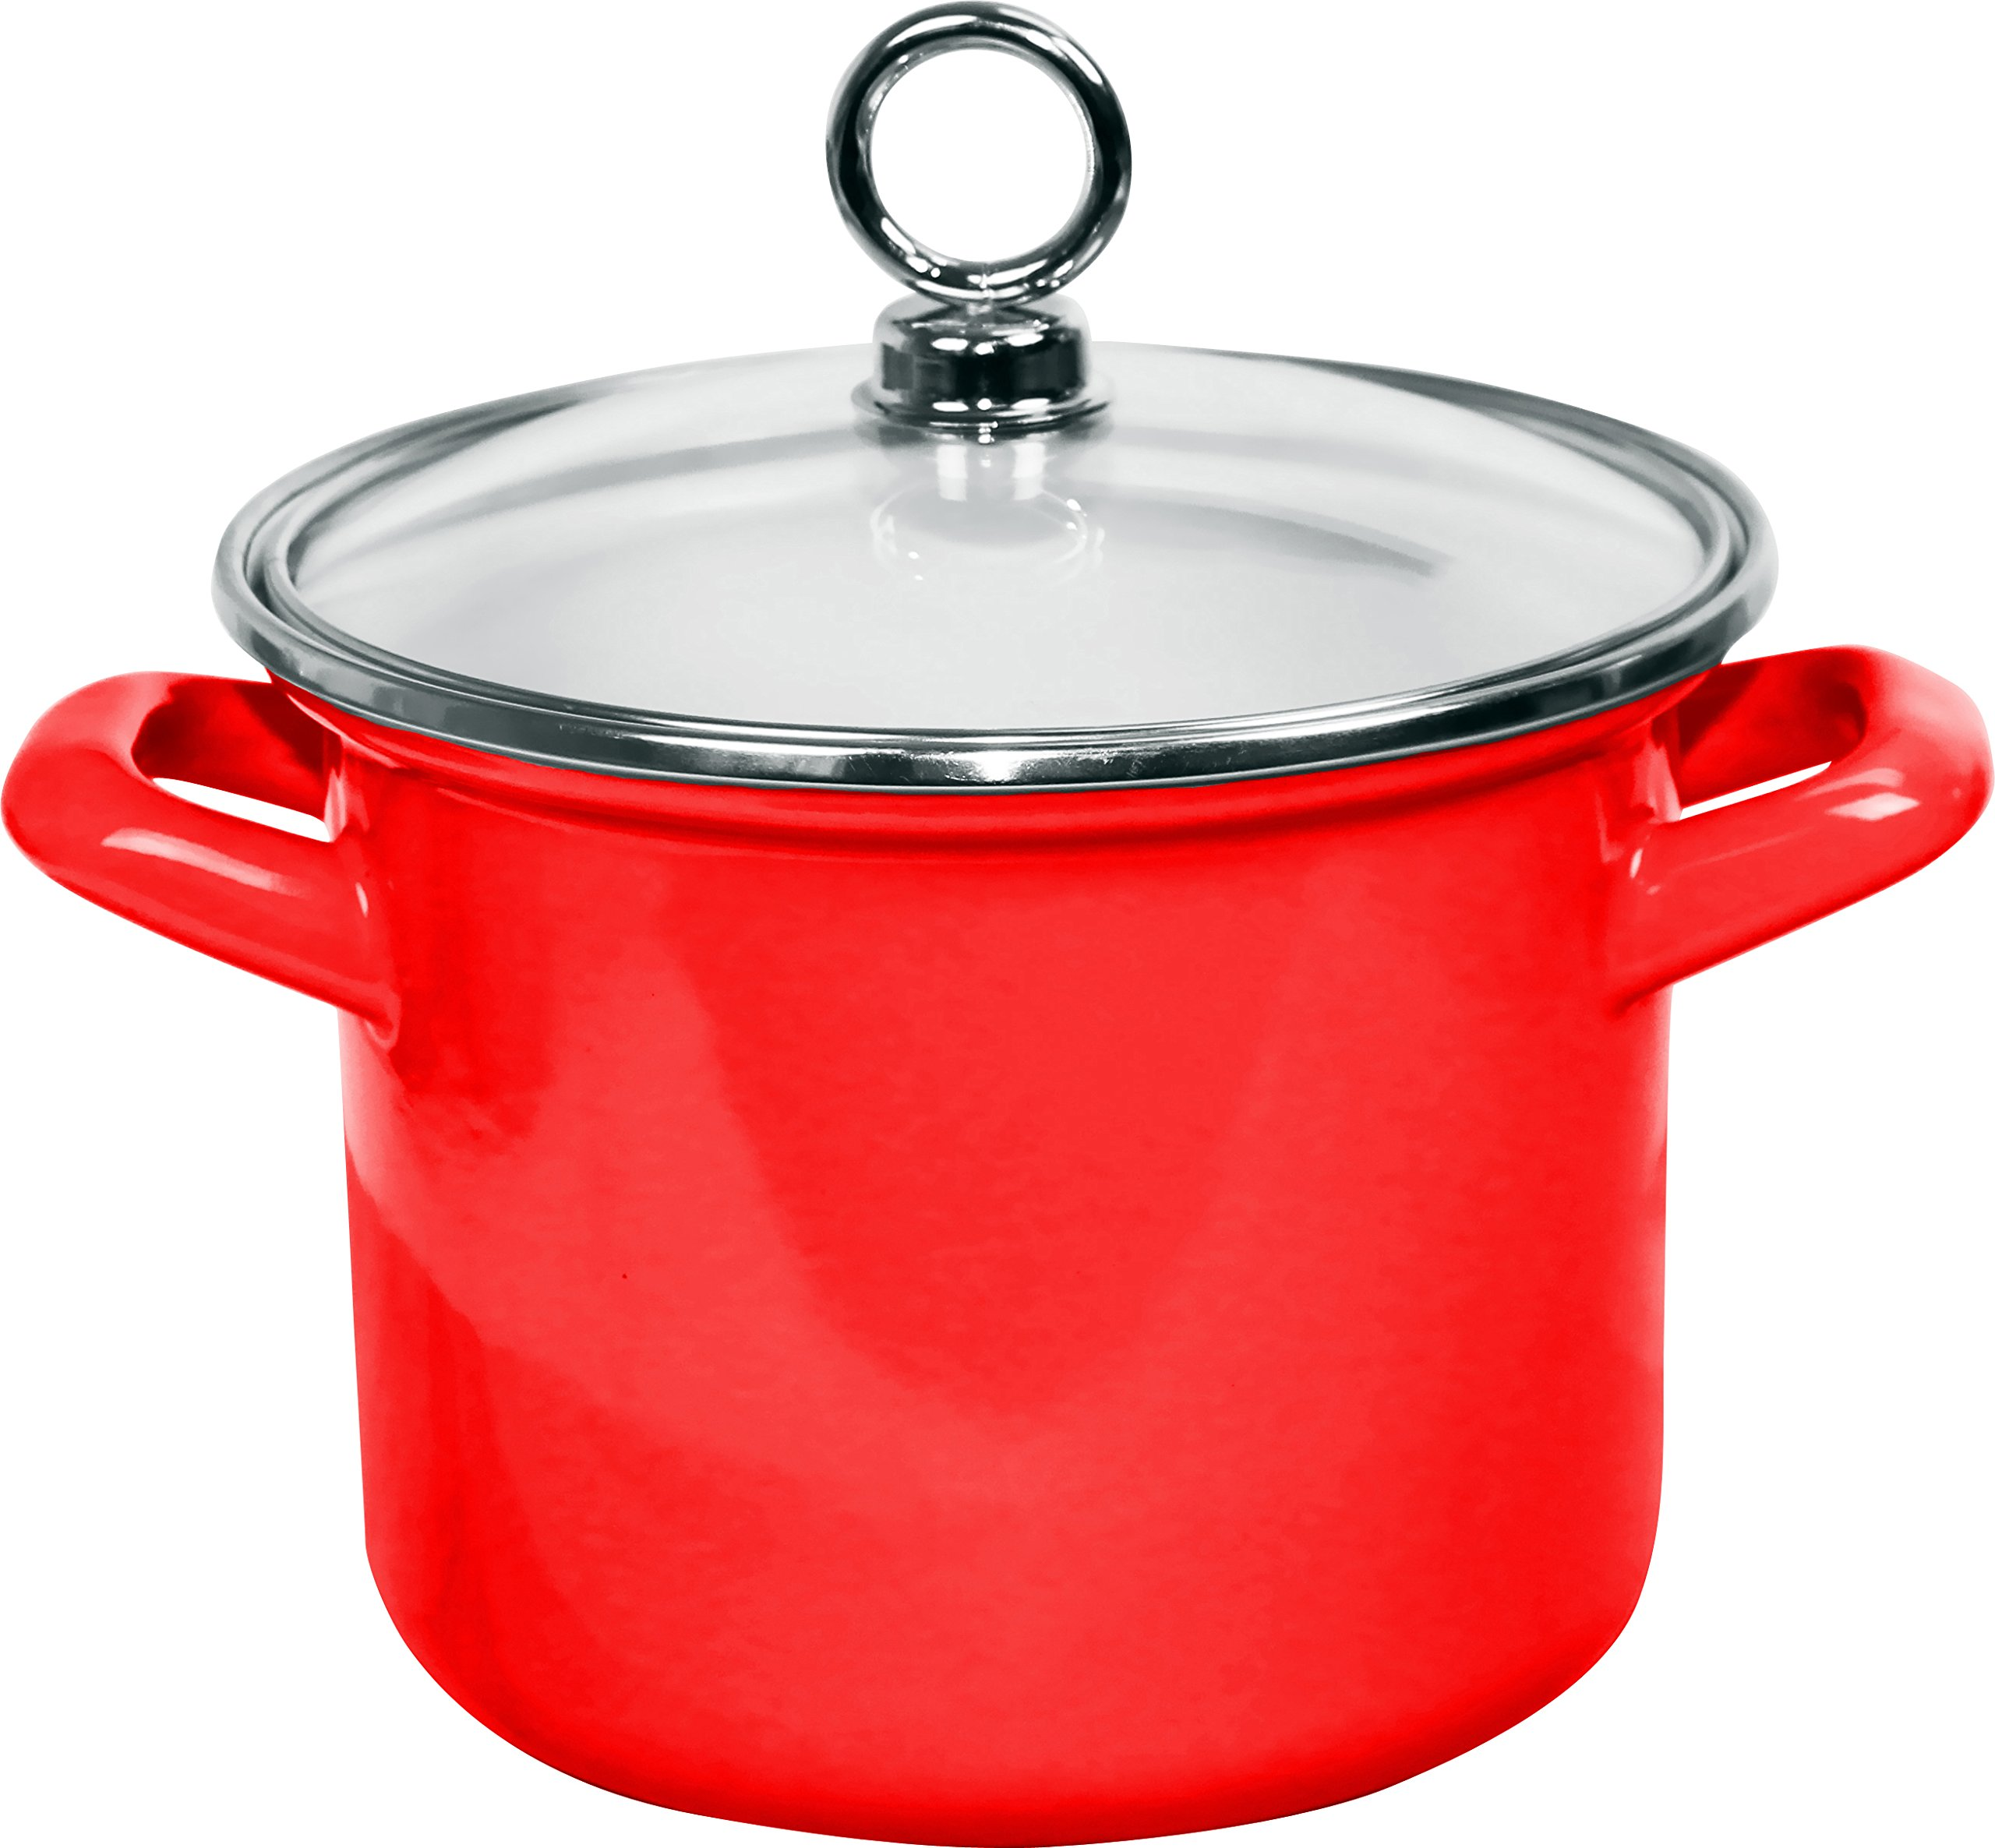 Calypso Basics by Reston Lloyd Enamel Stockpot with Glass Lid, 3.5-Quart, Red